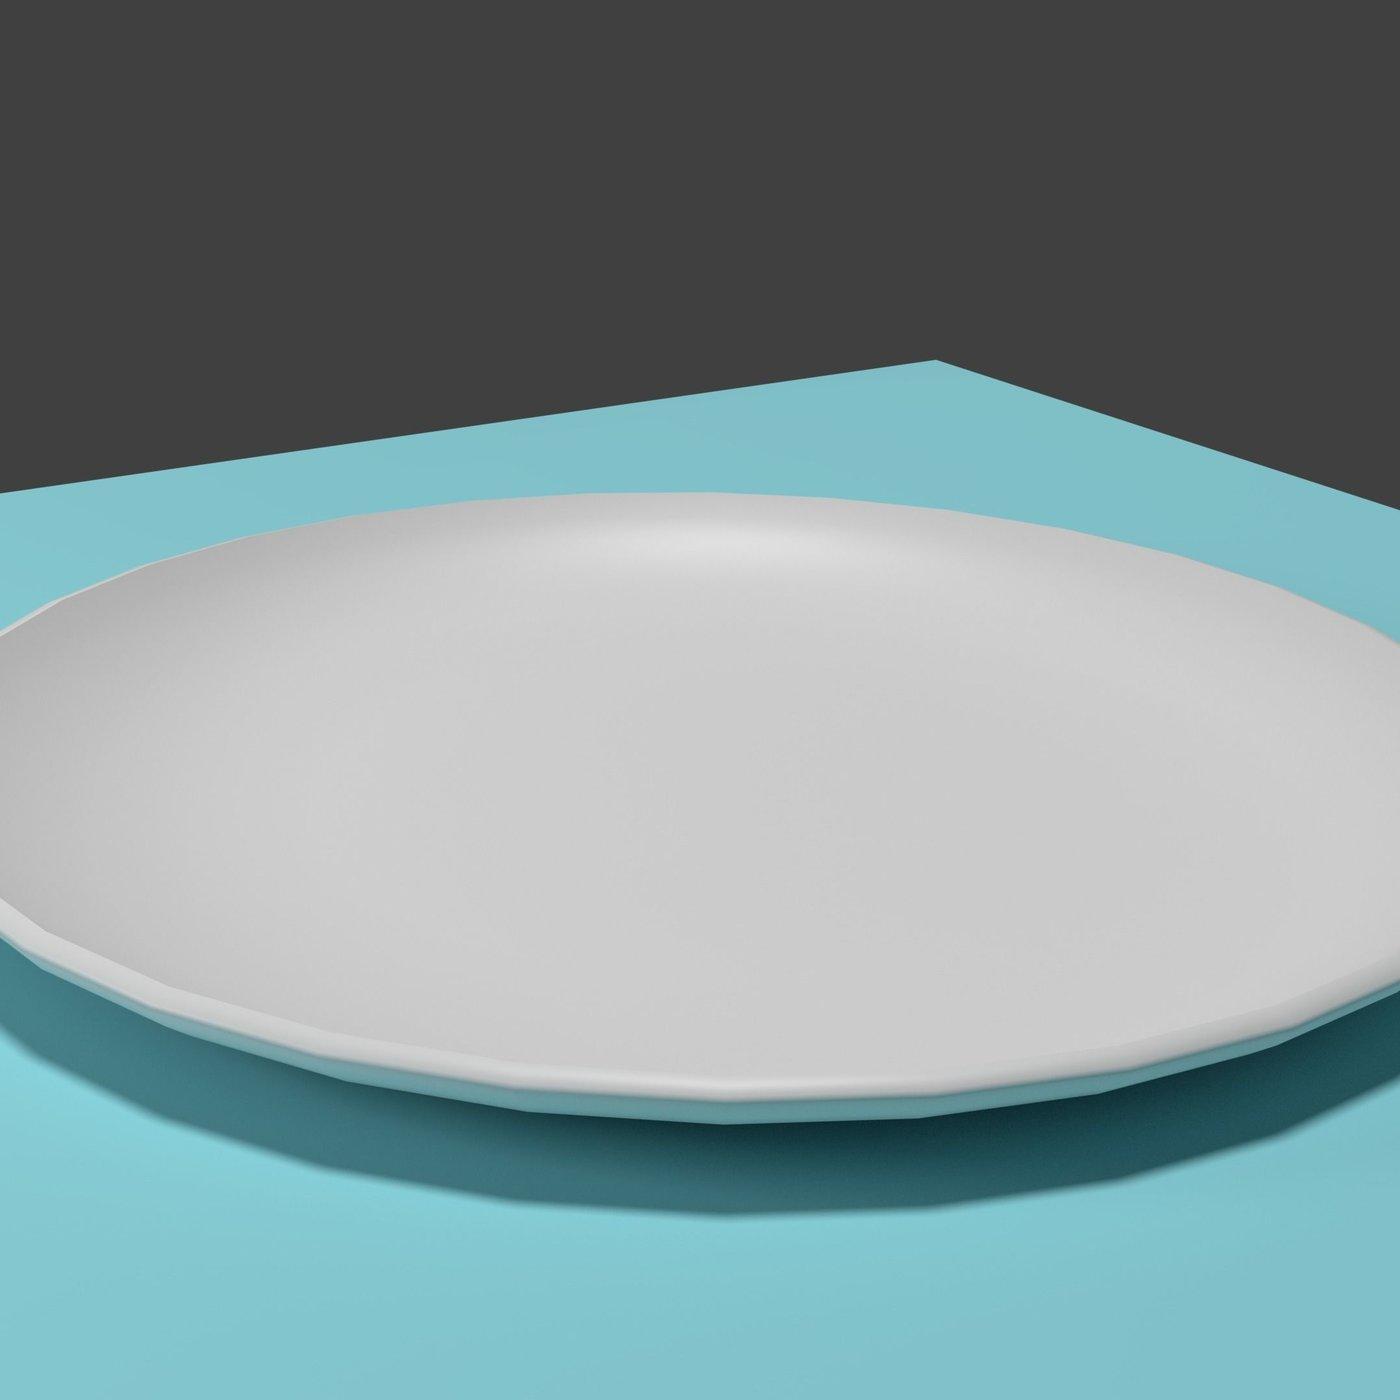 Realistic Ceramic Plate